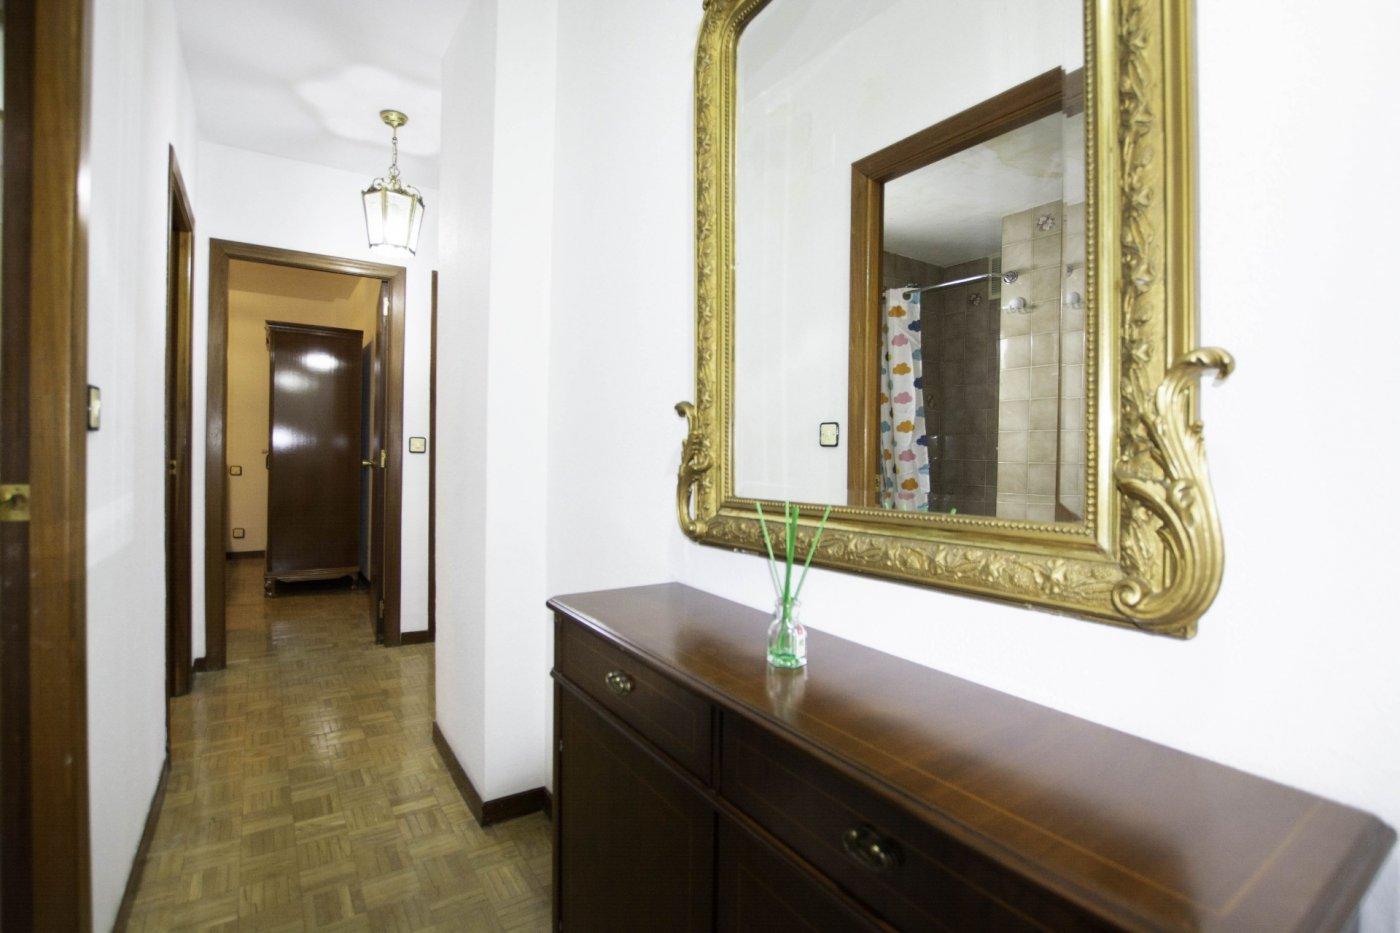 Apartamento en vallobin - imagenInmueble11